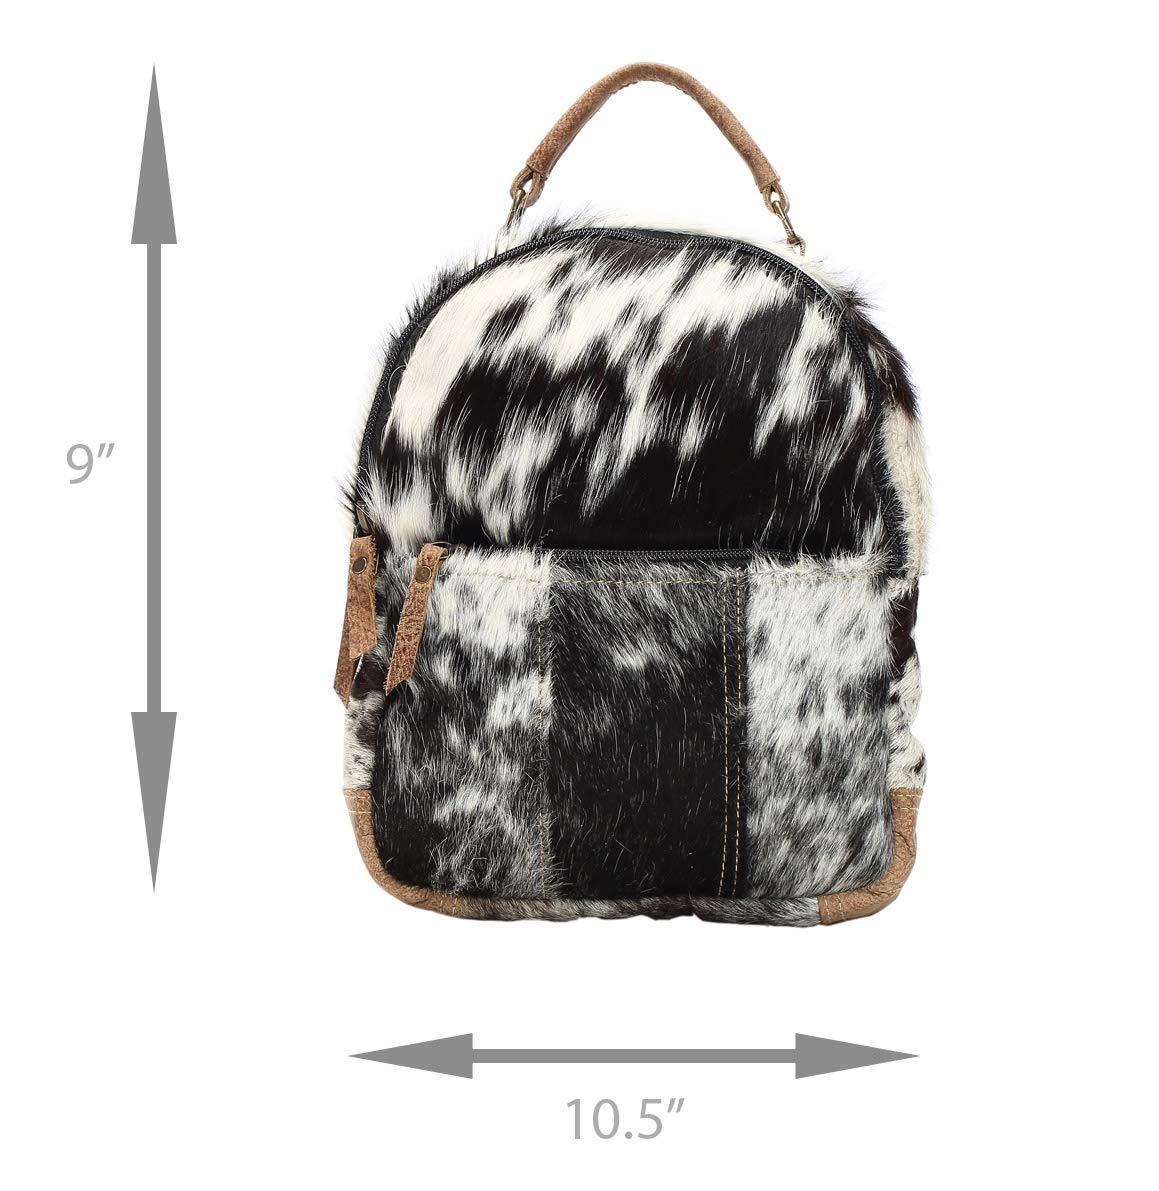 9d8a73997543 Amazon.com: Myra Bag Cowhide Backpack S-1169: Sports & Outdoors